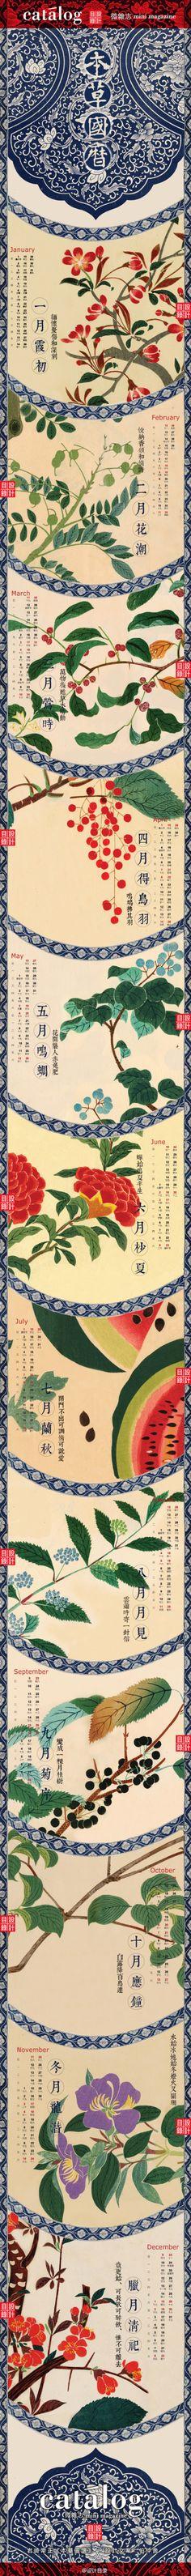 Chinese Herbs Calendar (本草國曆/月曆) #calendar